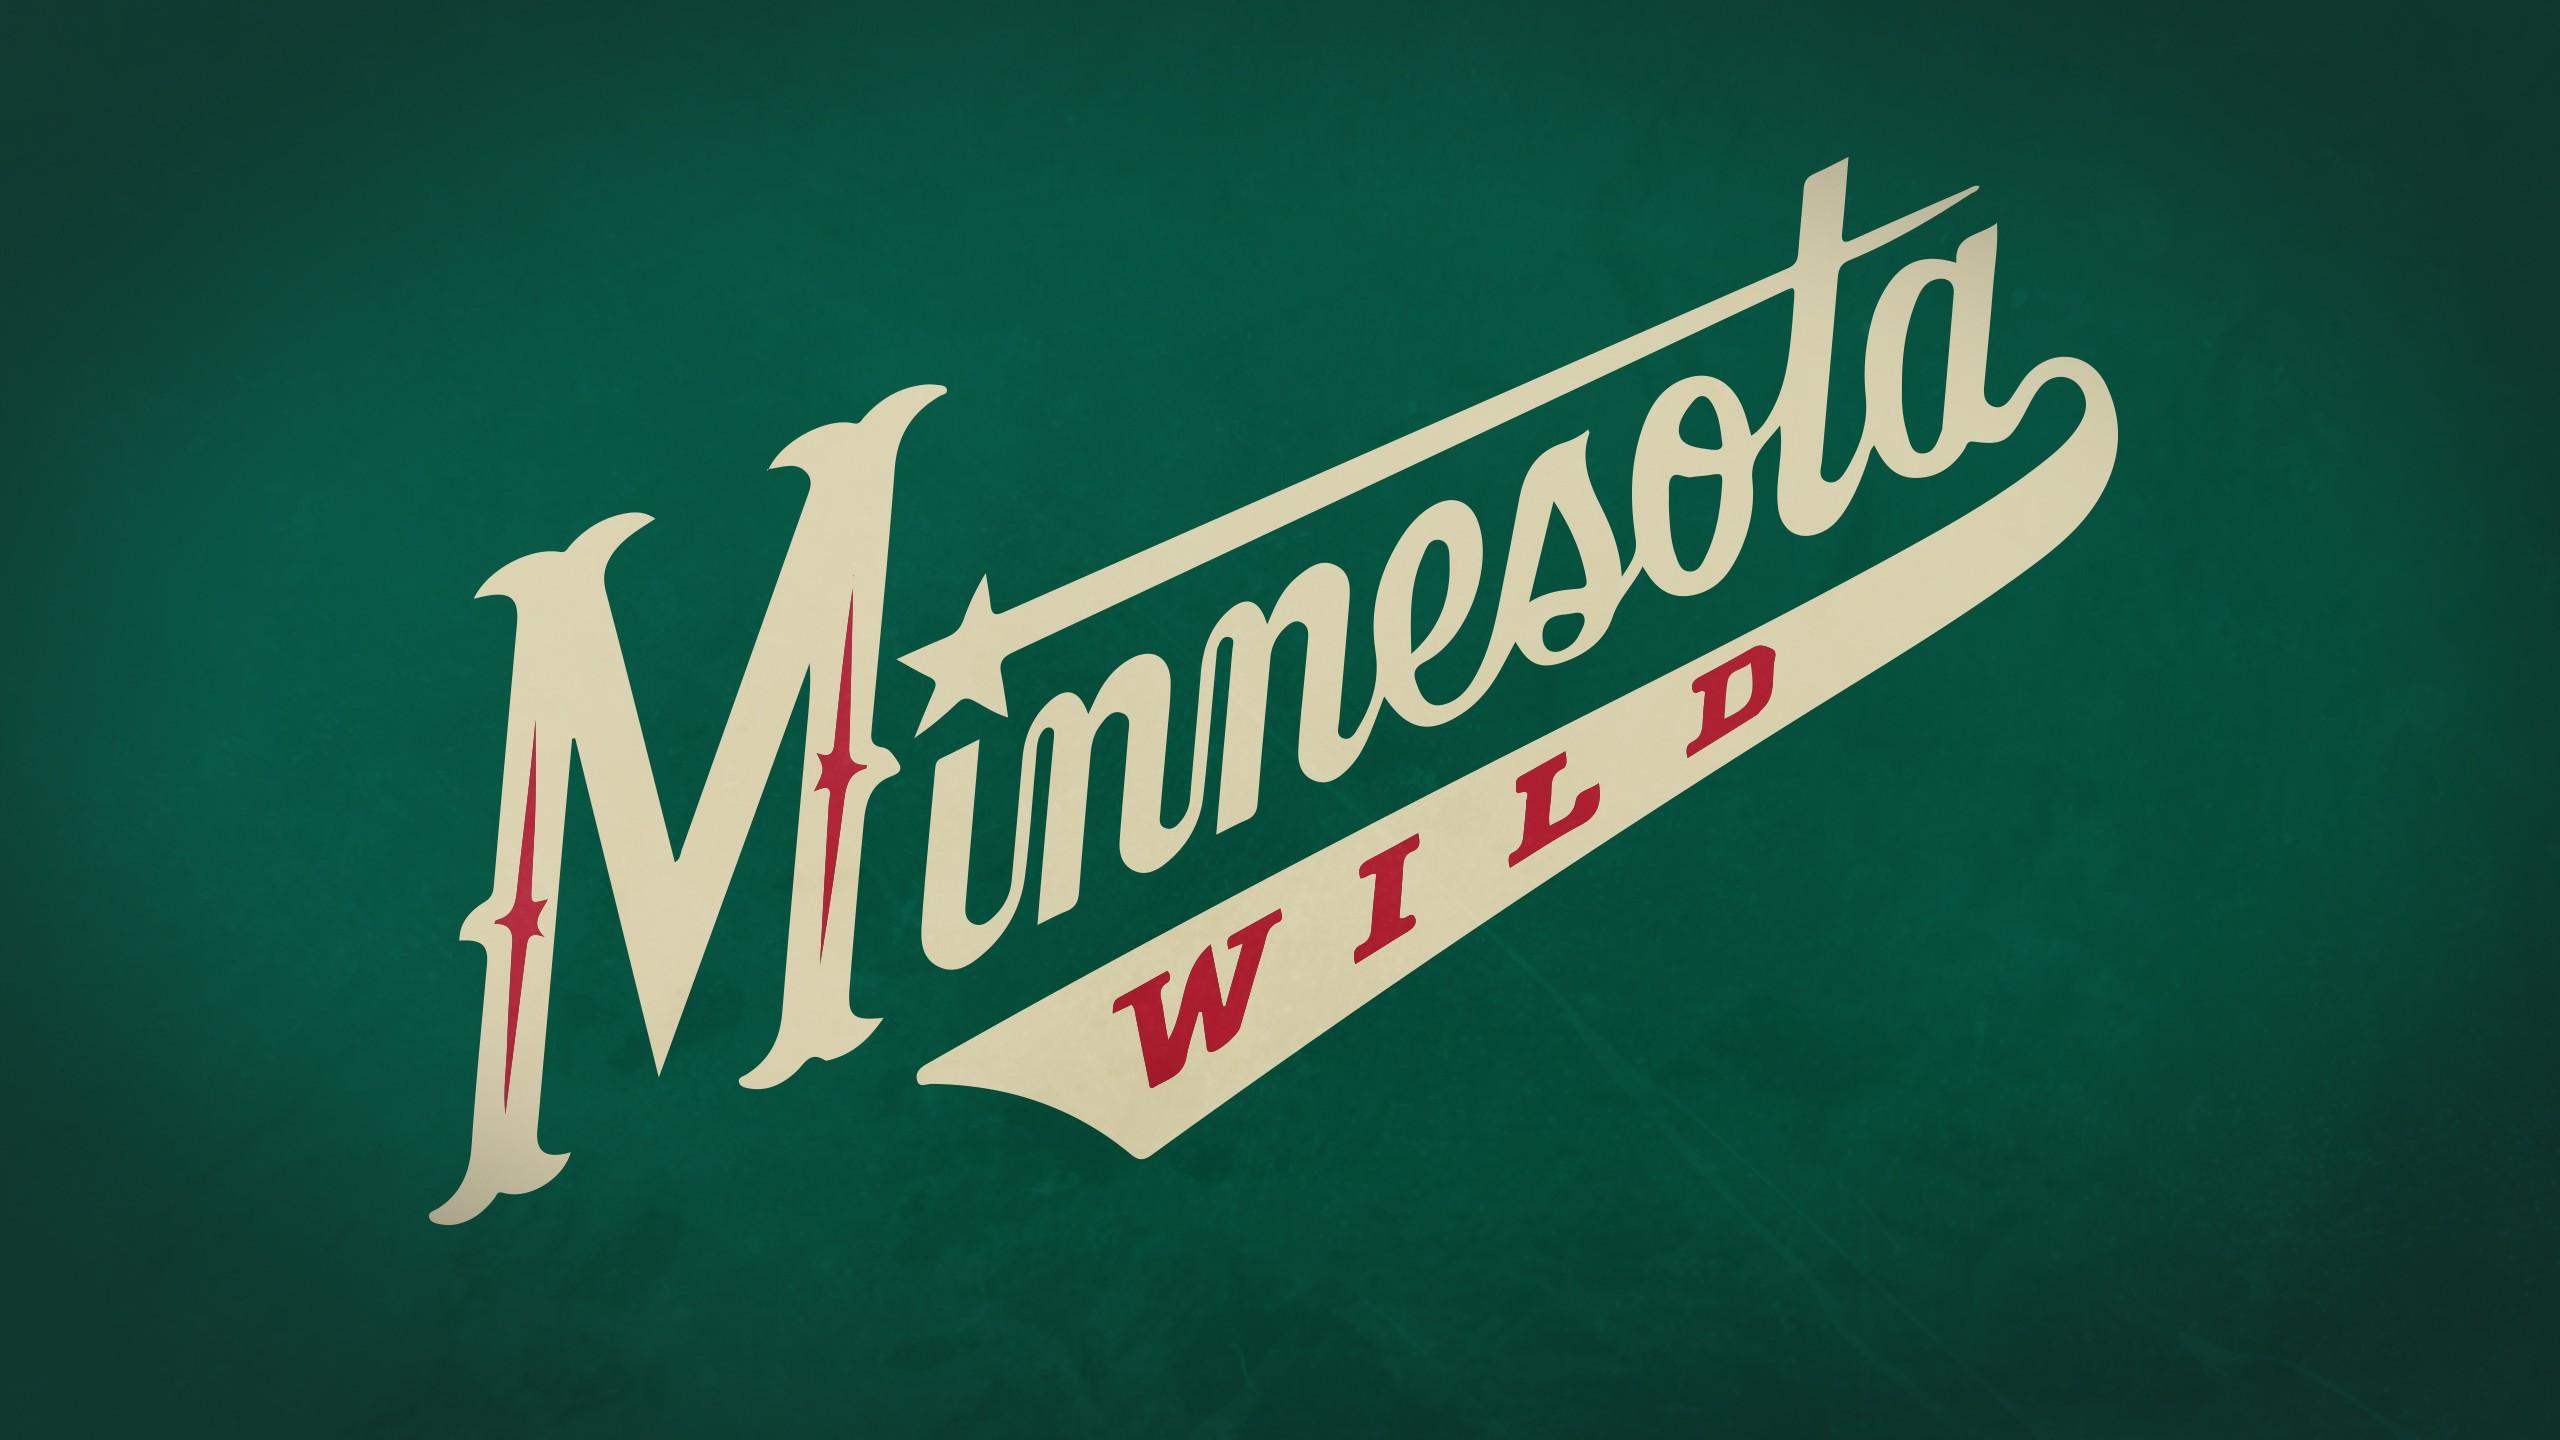 Minnesota Wild Computer Wallpapers Desktop Backgrounds 2560x1440 2560x1440